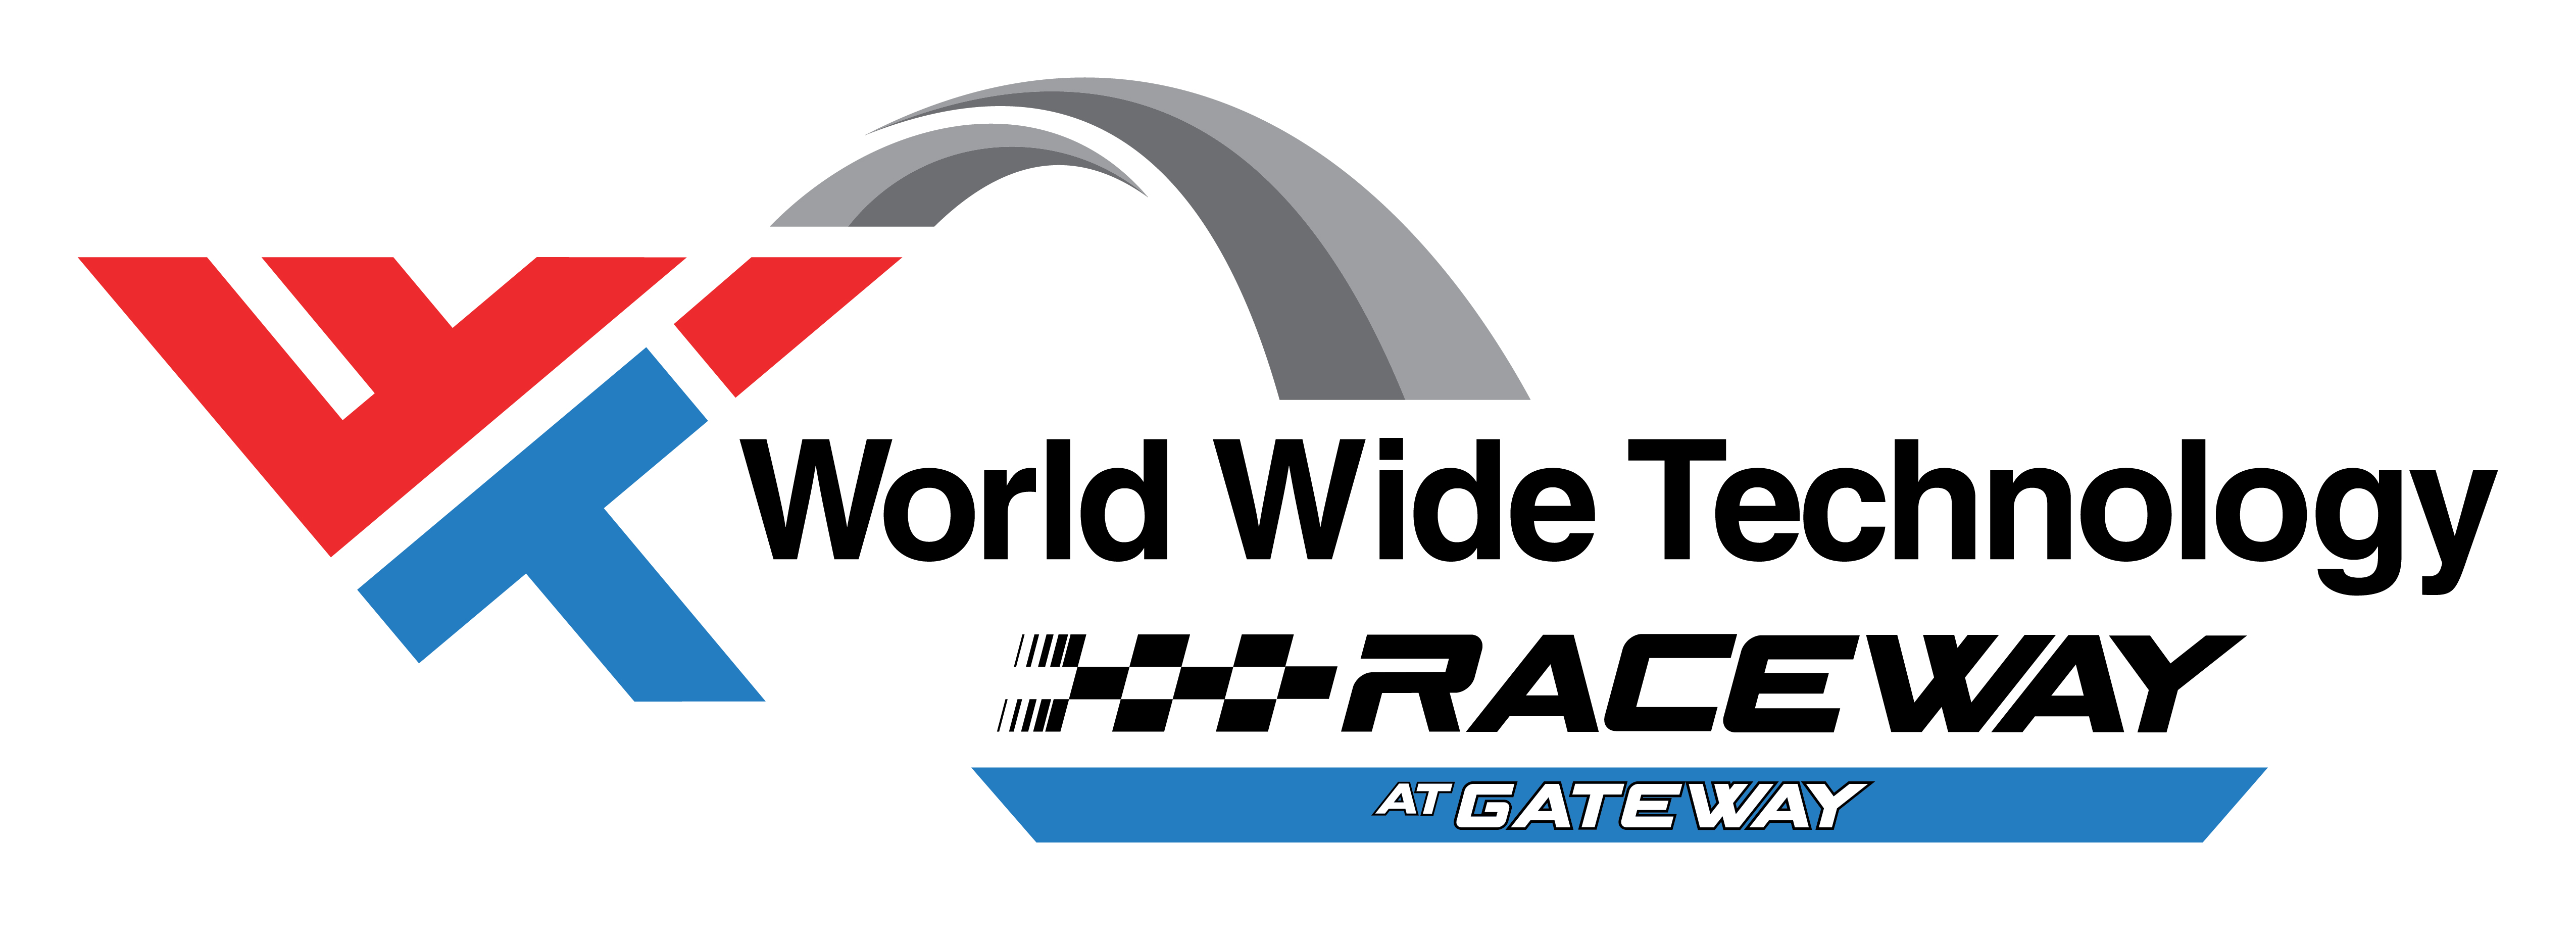 Bubba Raceway Park >> World Wide Technology Inks Deal To Make St. Louis A Racing ...